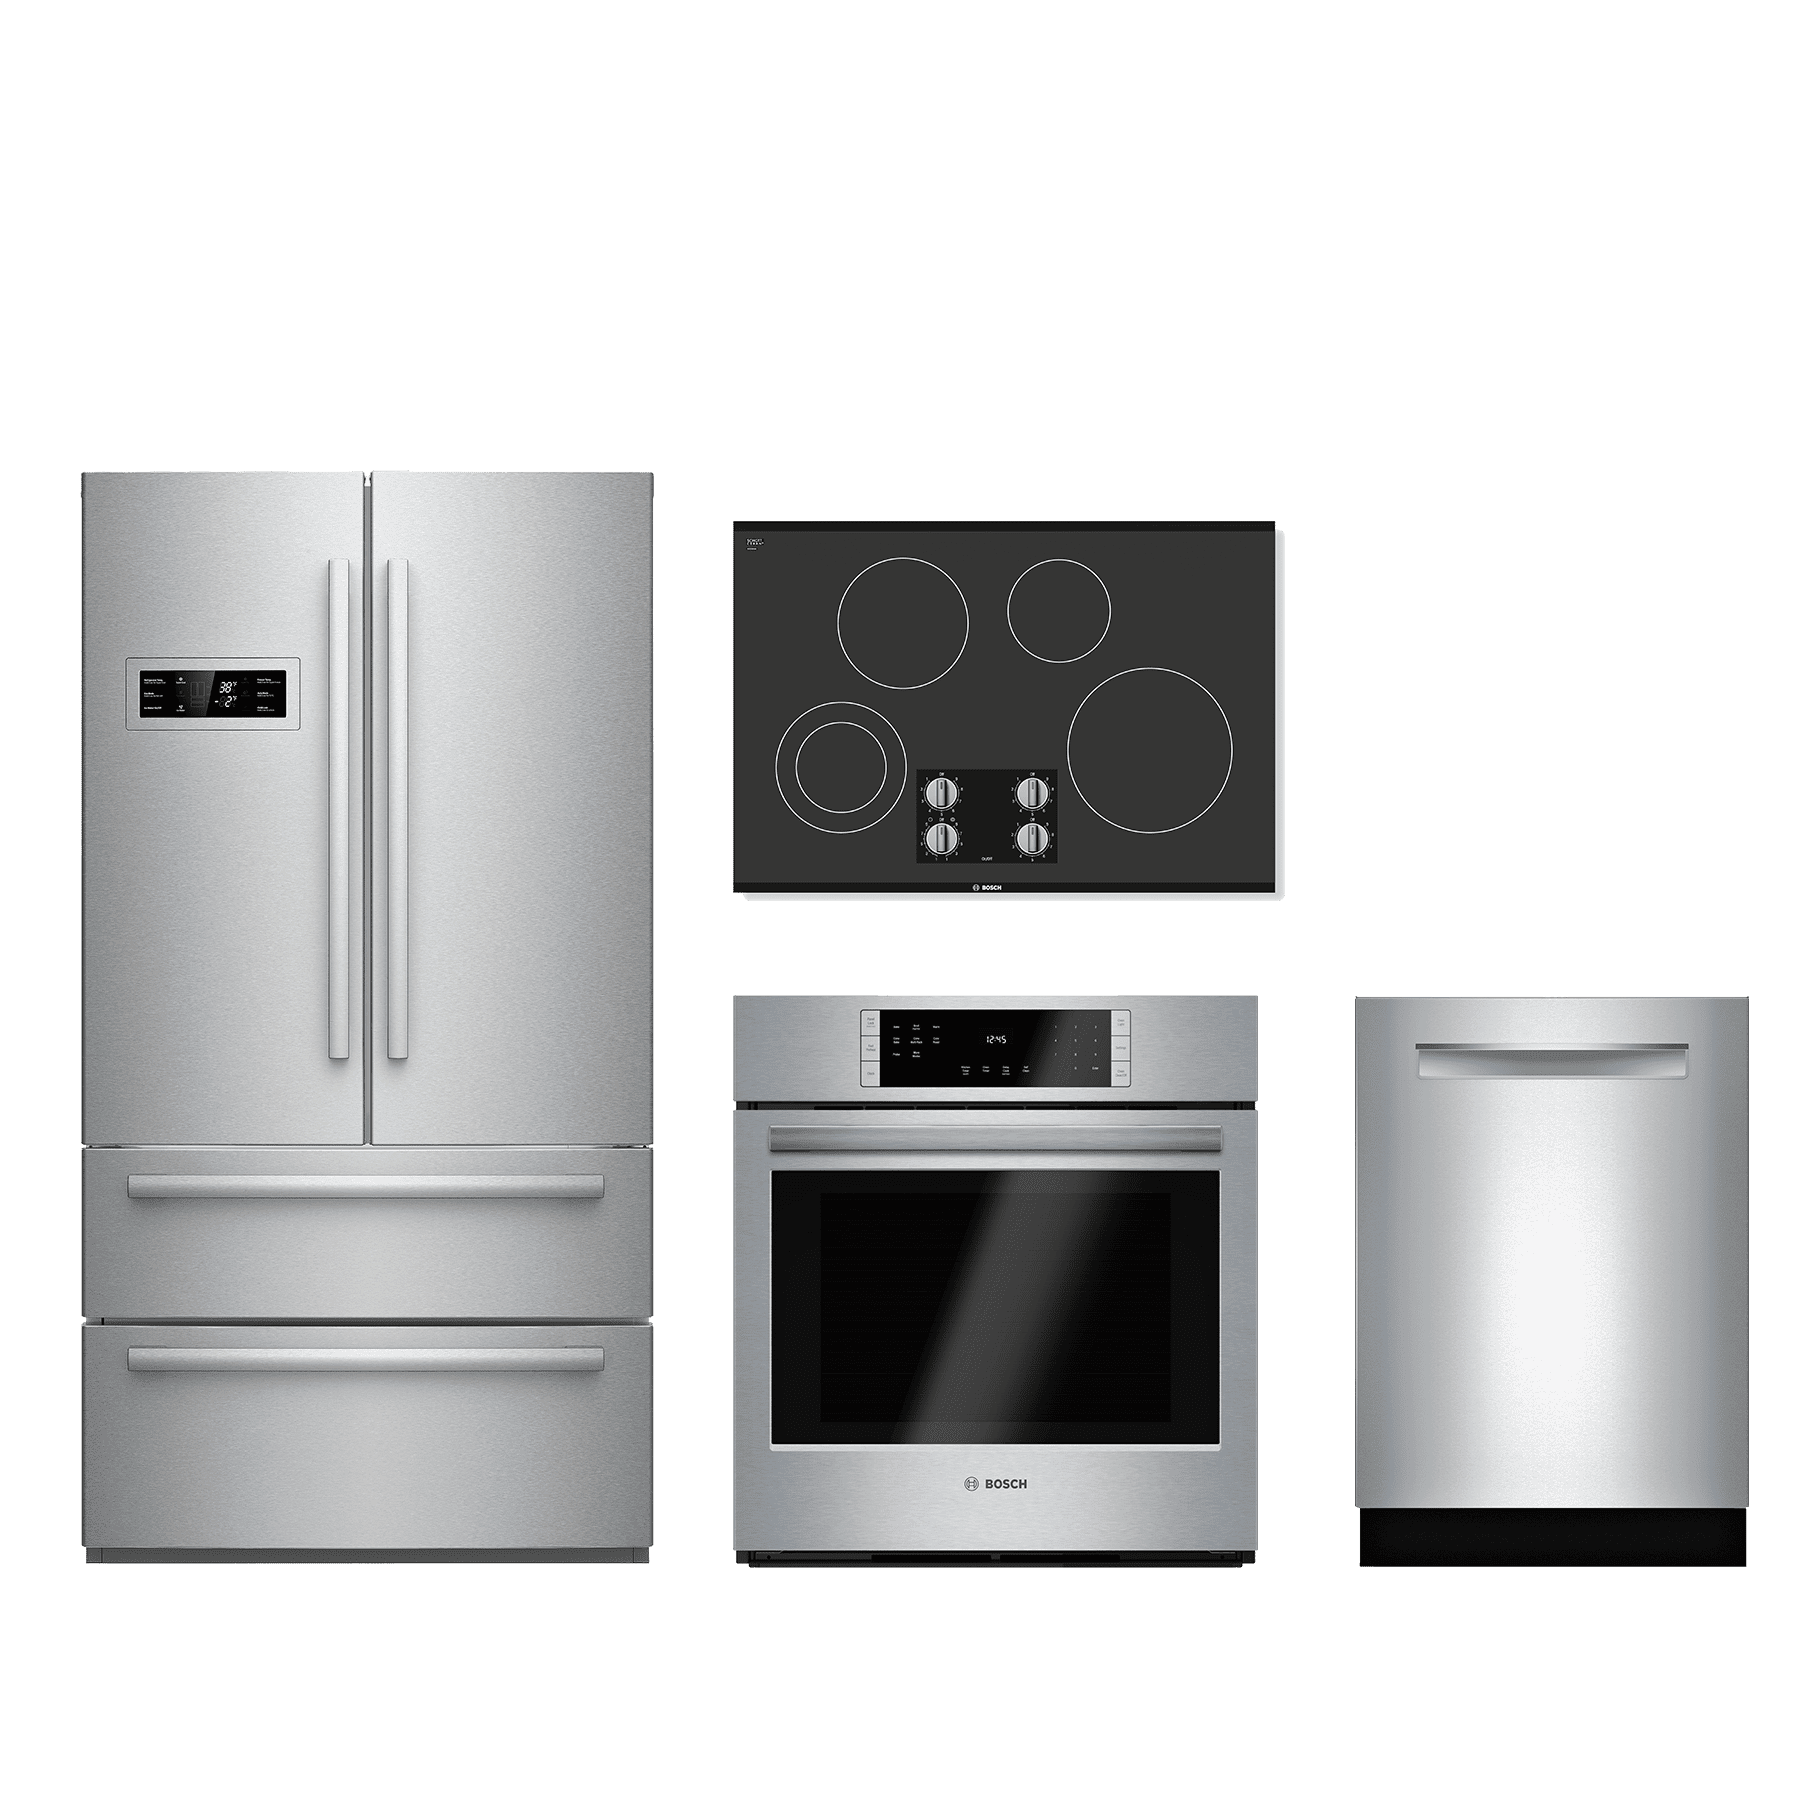 Kitchen appliance packages bosch 4 piece kitchen package stainless steel bokitnem5066uc workwithnaturefo